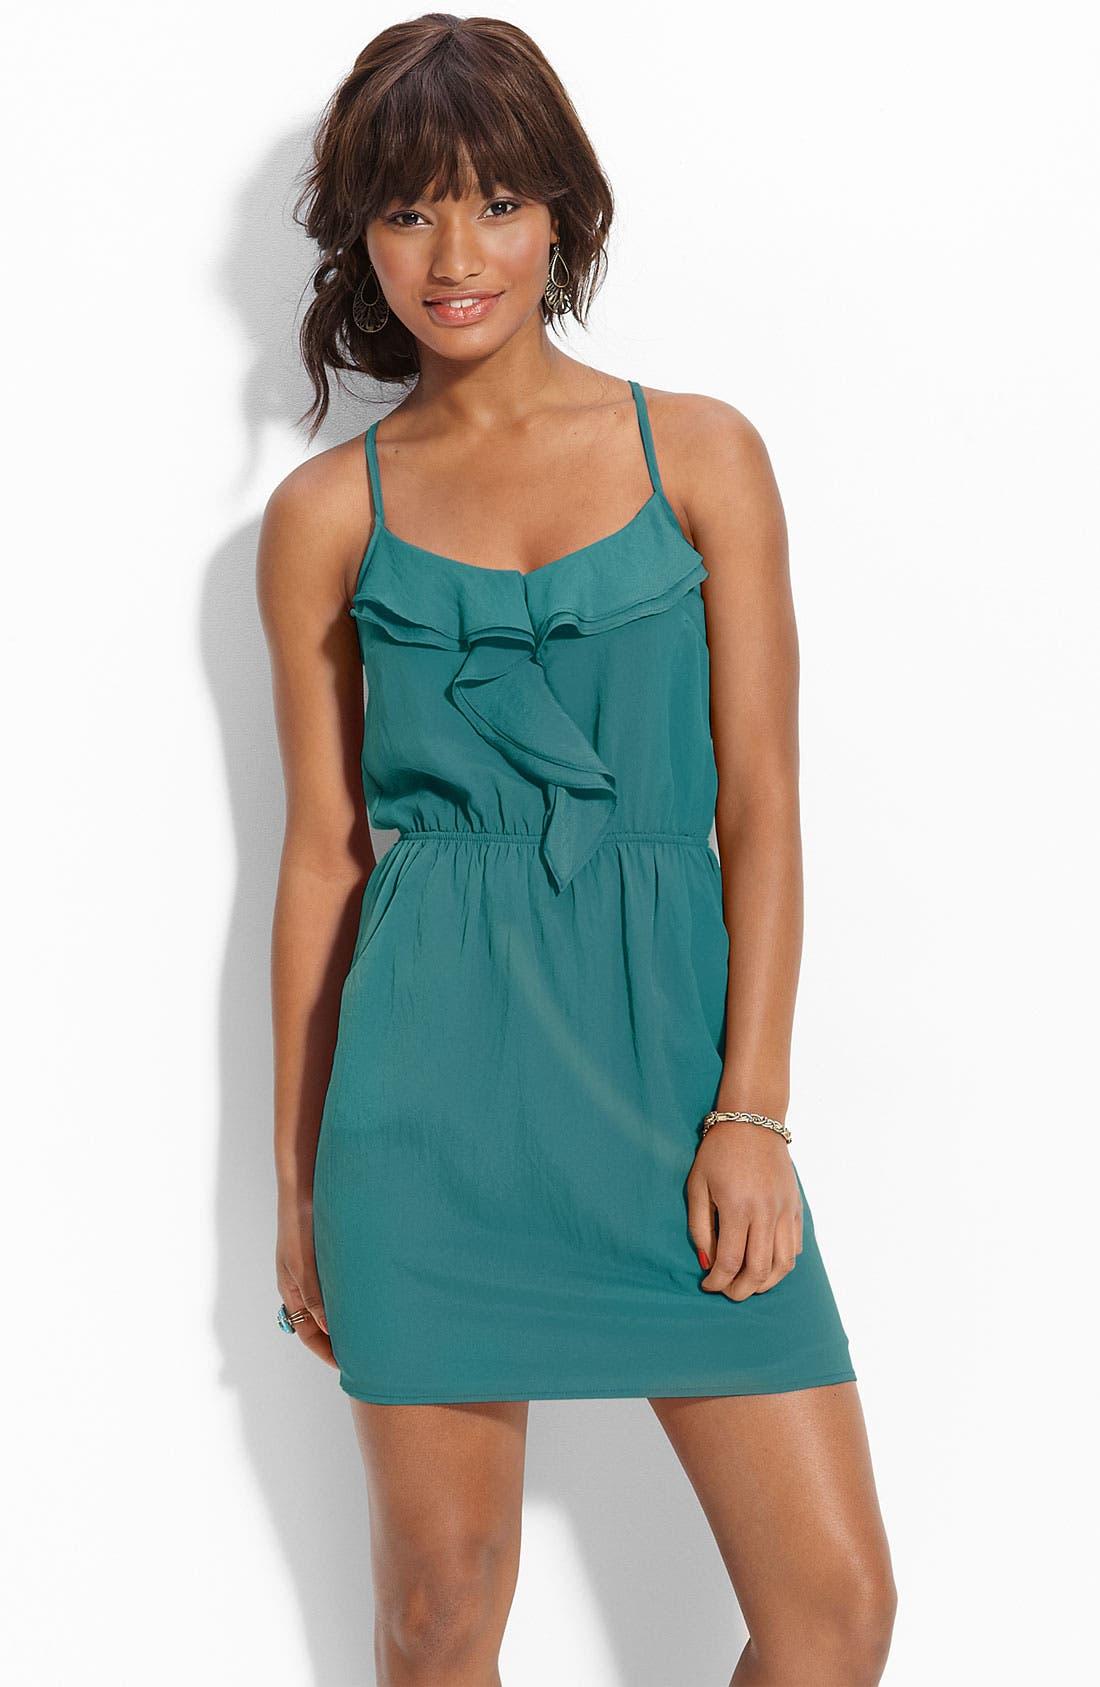 Alternate Image 1 Selected - Lush Ruffled Racerback Dress (Juniors)